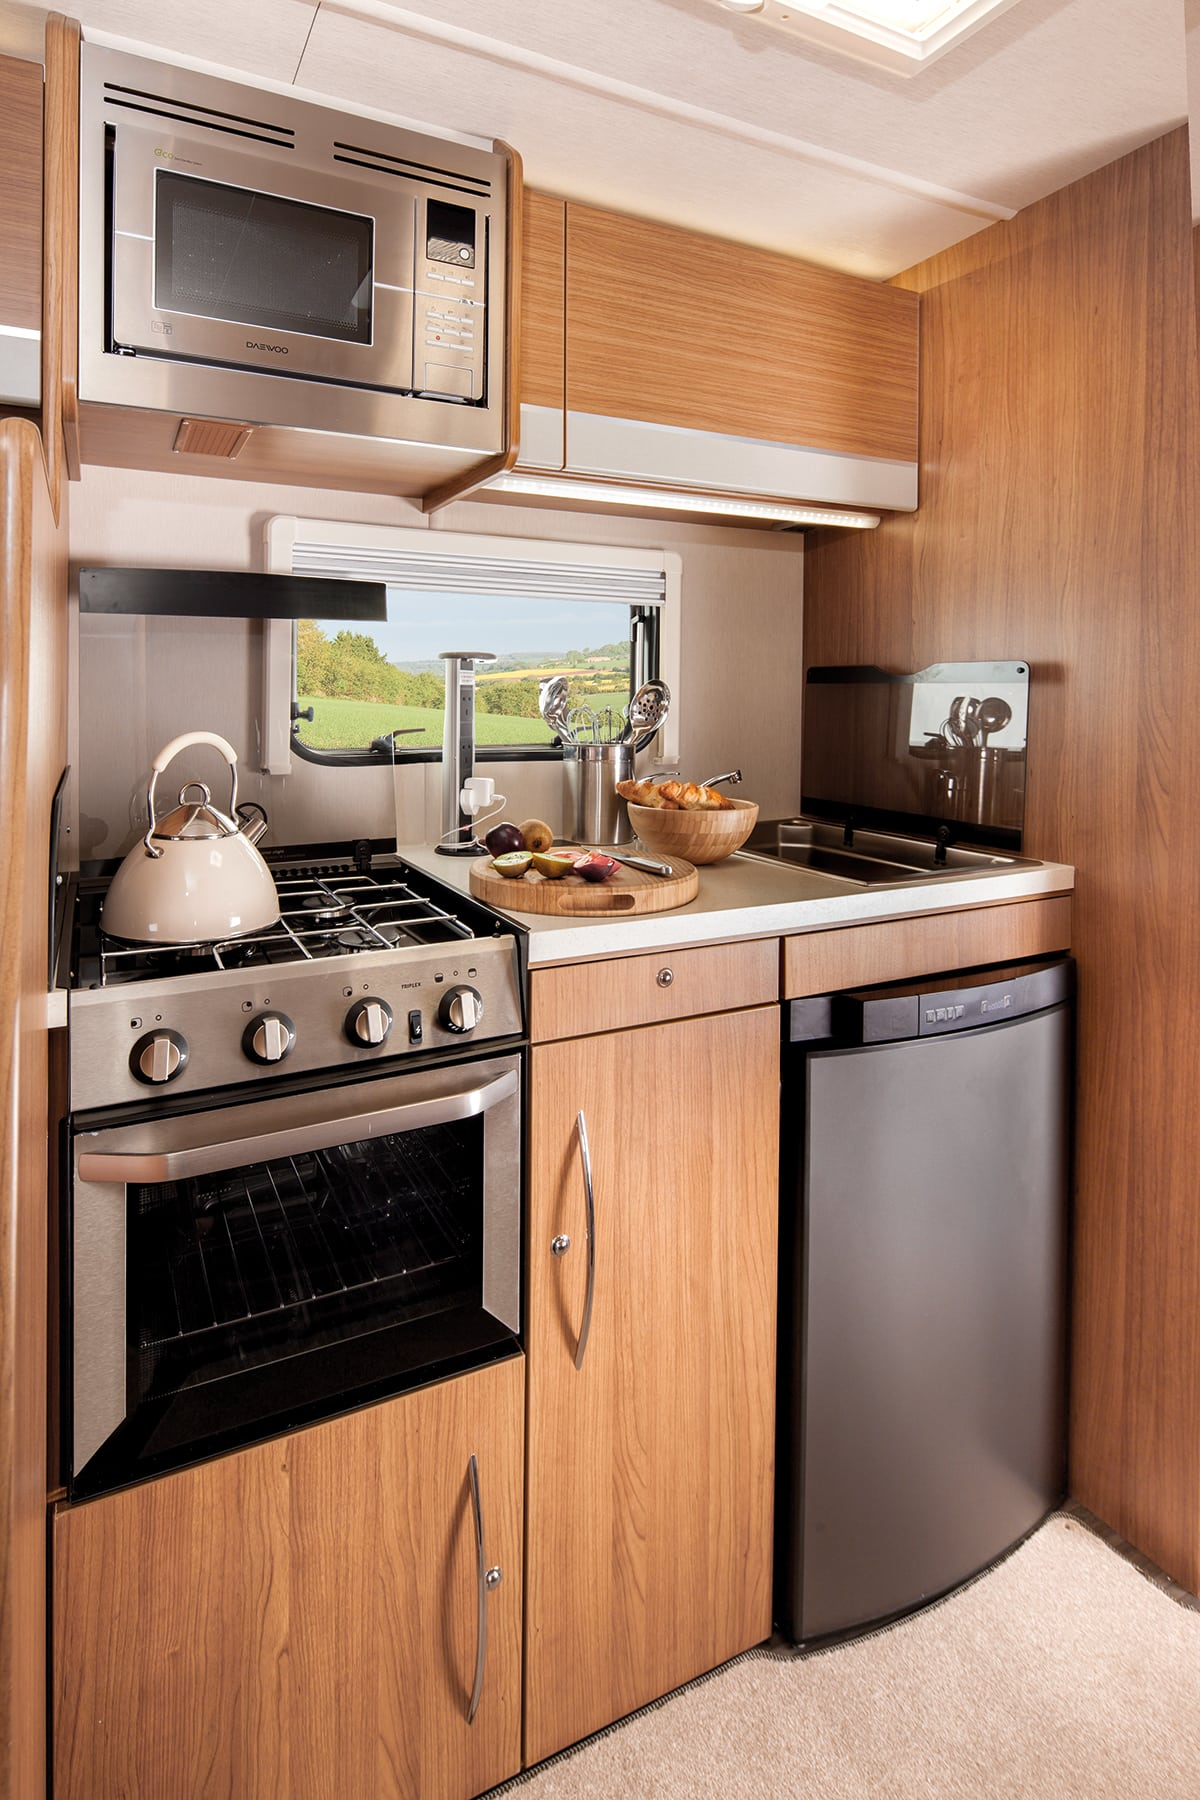 Highlander 726 6 berth motorhome scotland open road for Luxury kitchens scotland